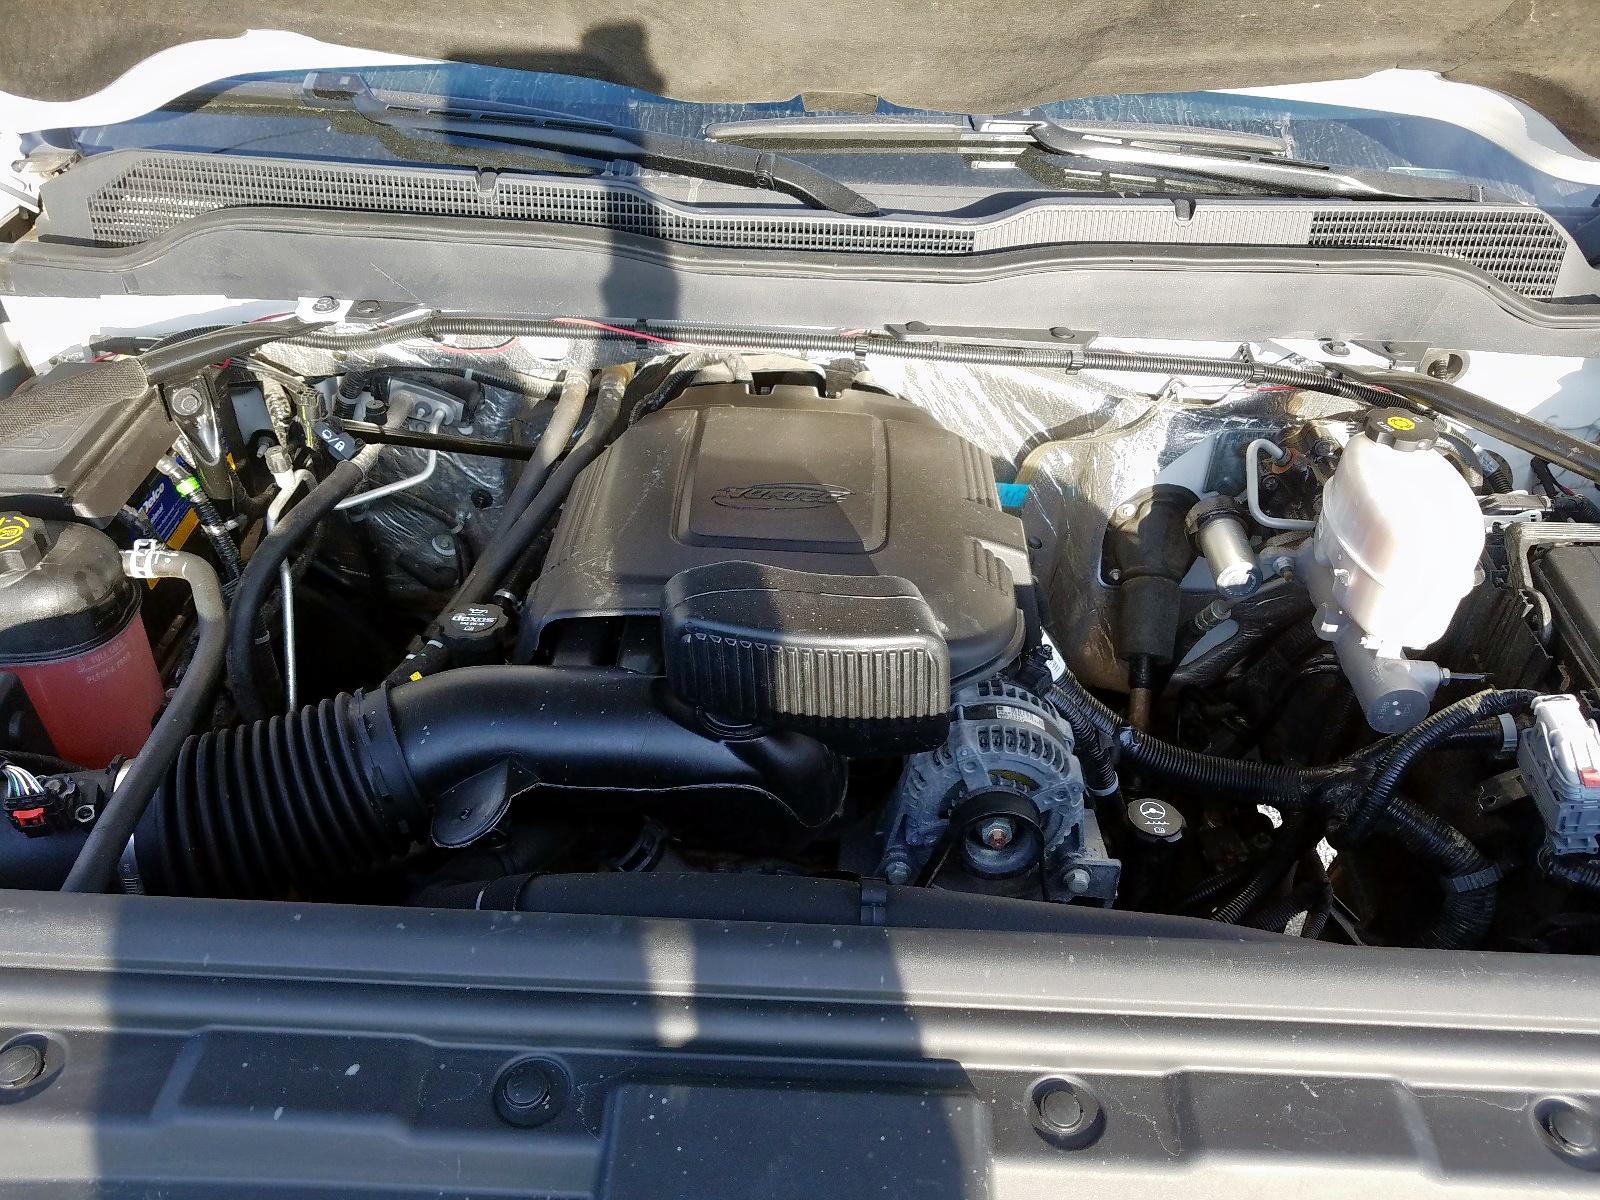 1GC1CVEG1GF279626 - 2016 Chevrolet Silverado 6.0L inside view